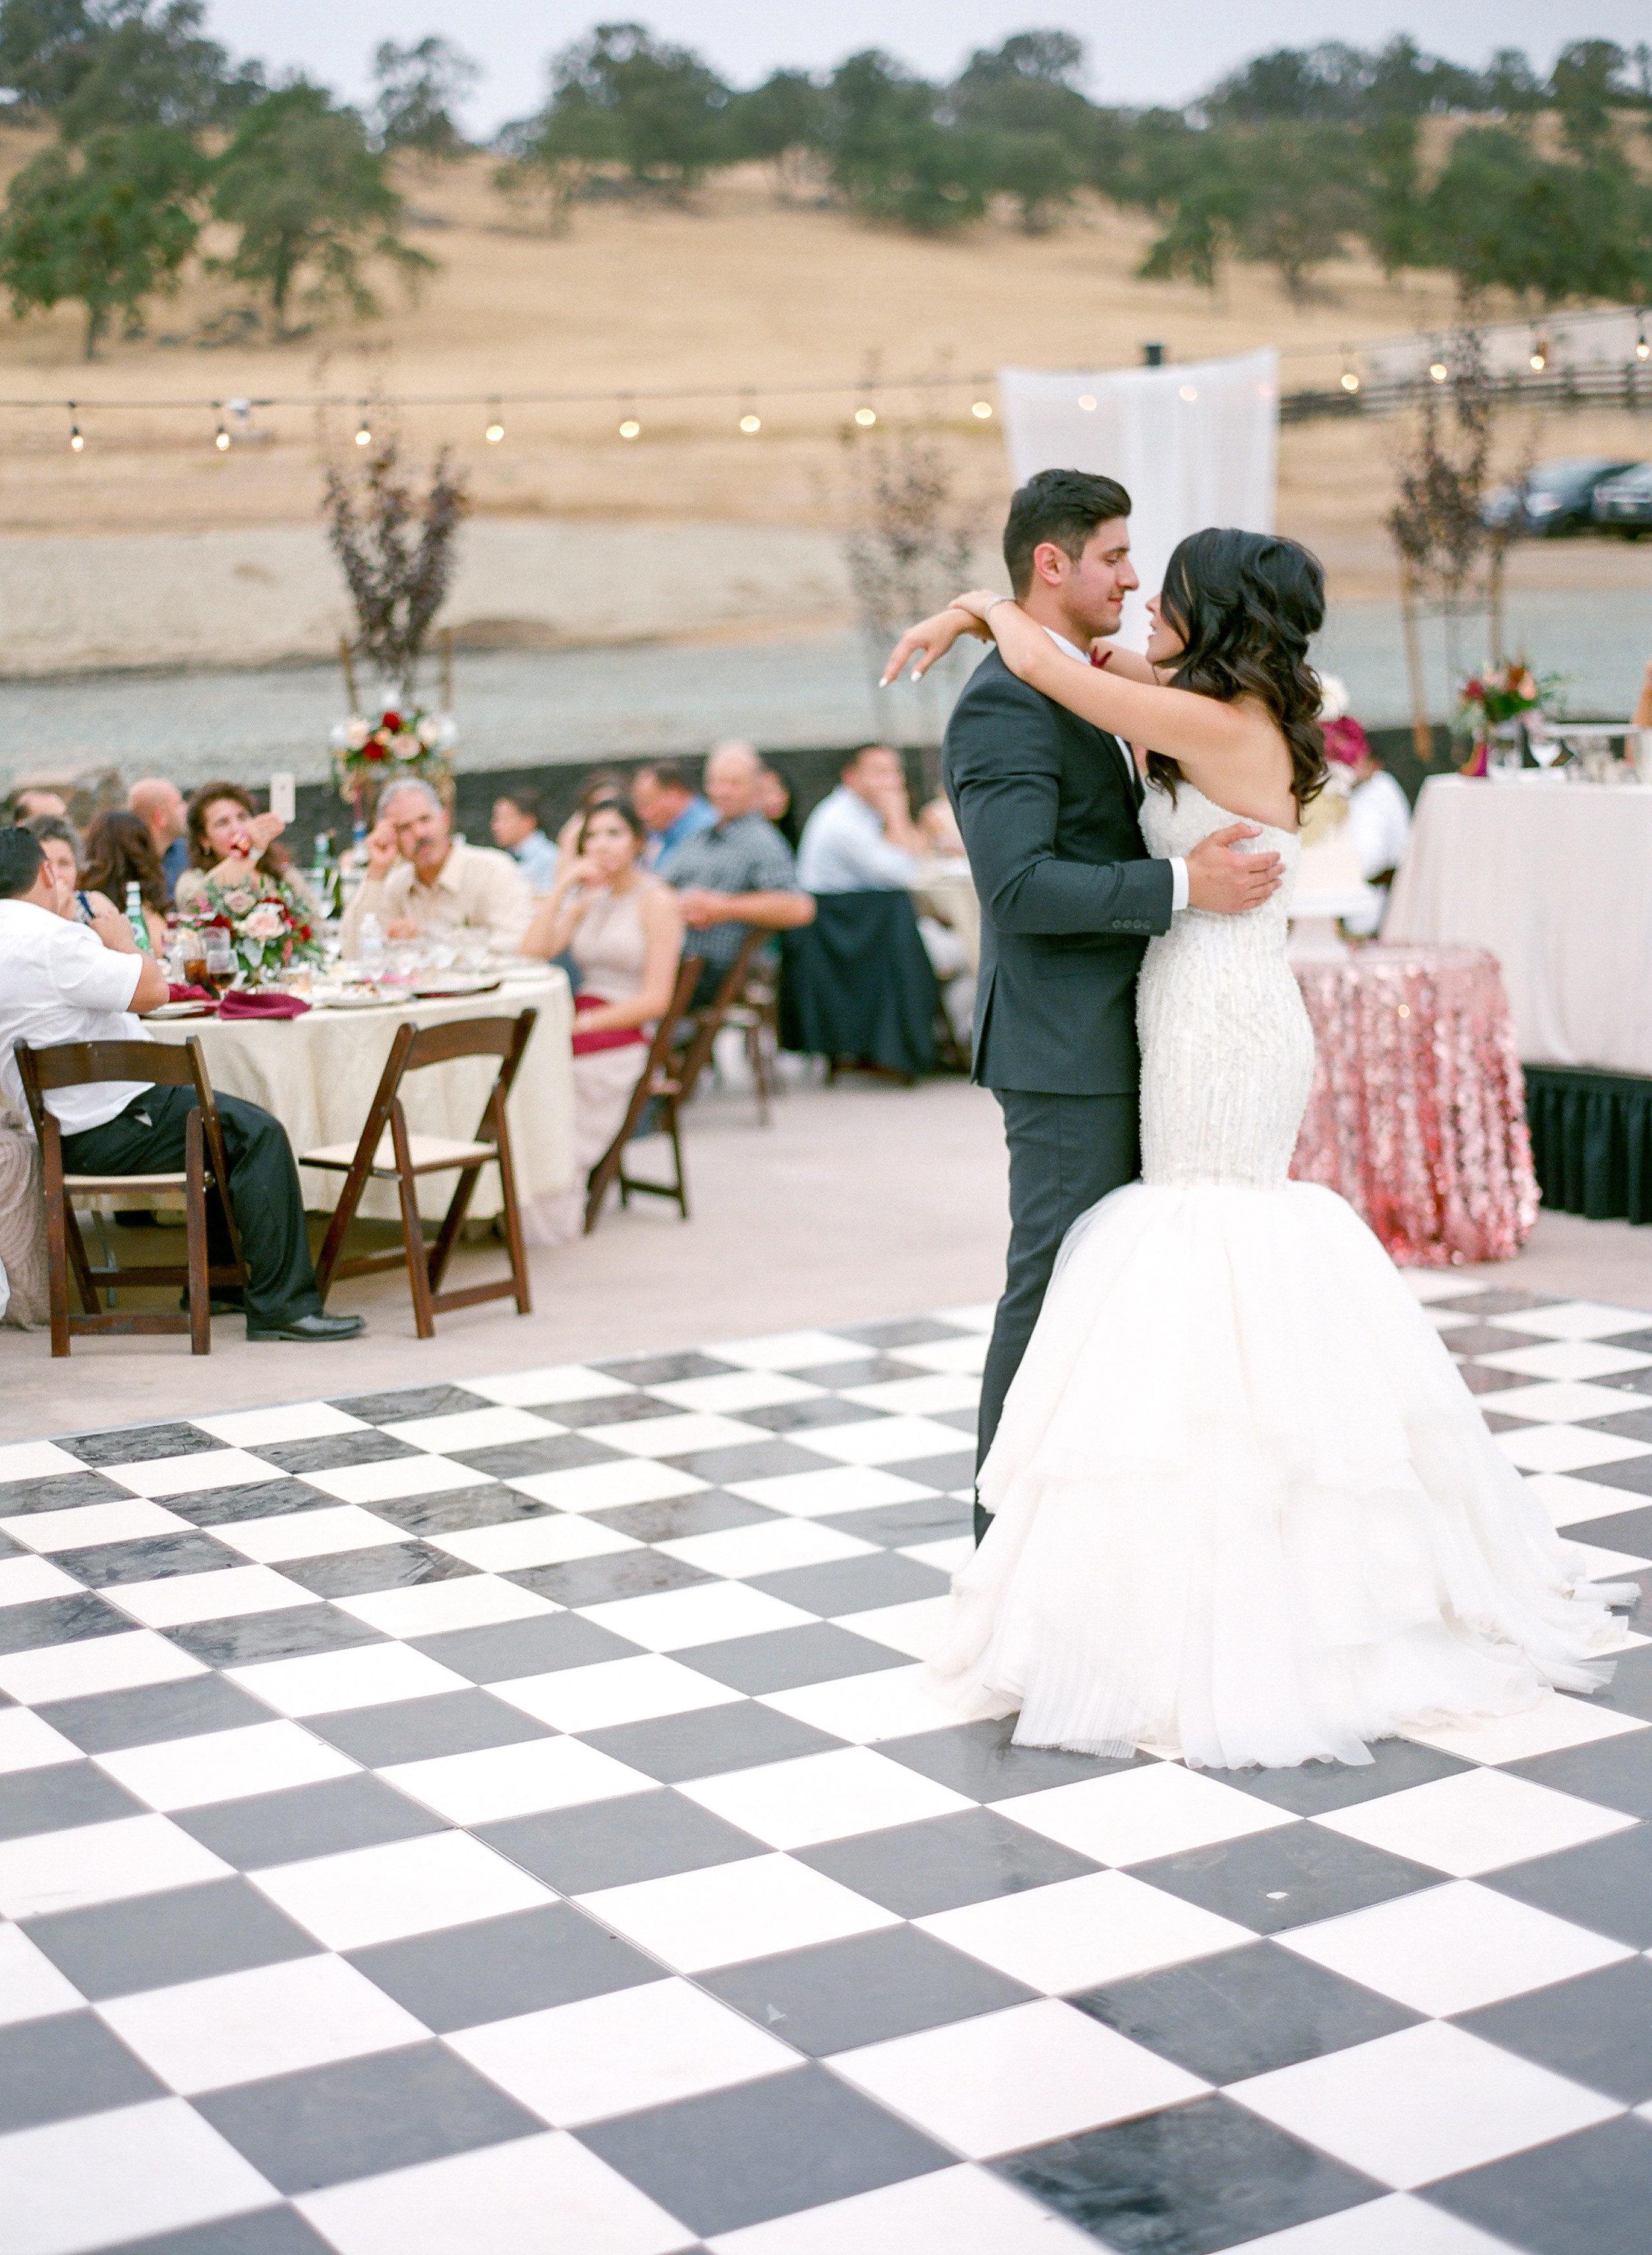 Amador_County_Wedding_Florist_Bride_Groom_Dance_Romantic_Lights_Outdoor_Summer_Evening_Pink_Burgundy_Rancho_Victoria_Vineyard_Northern_California.jpg